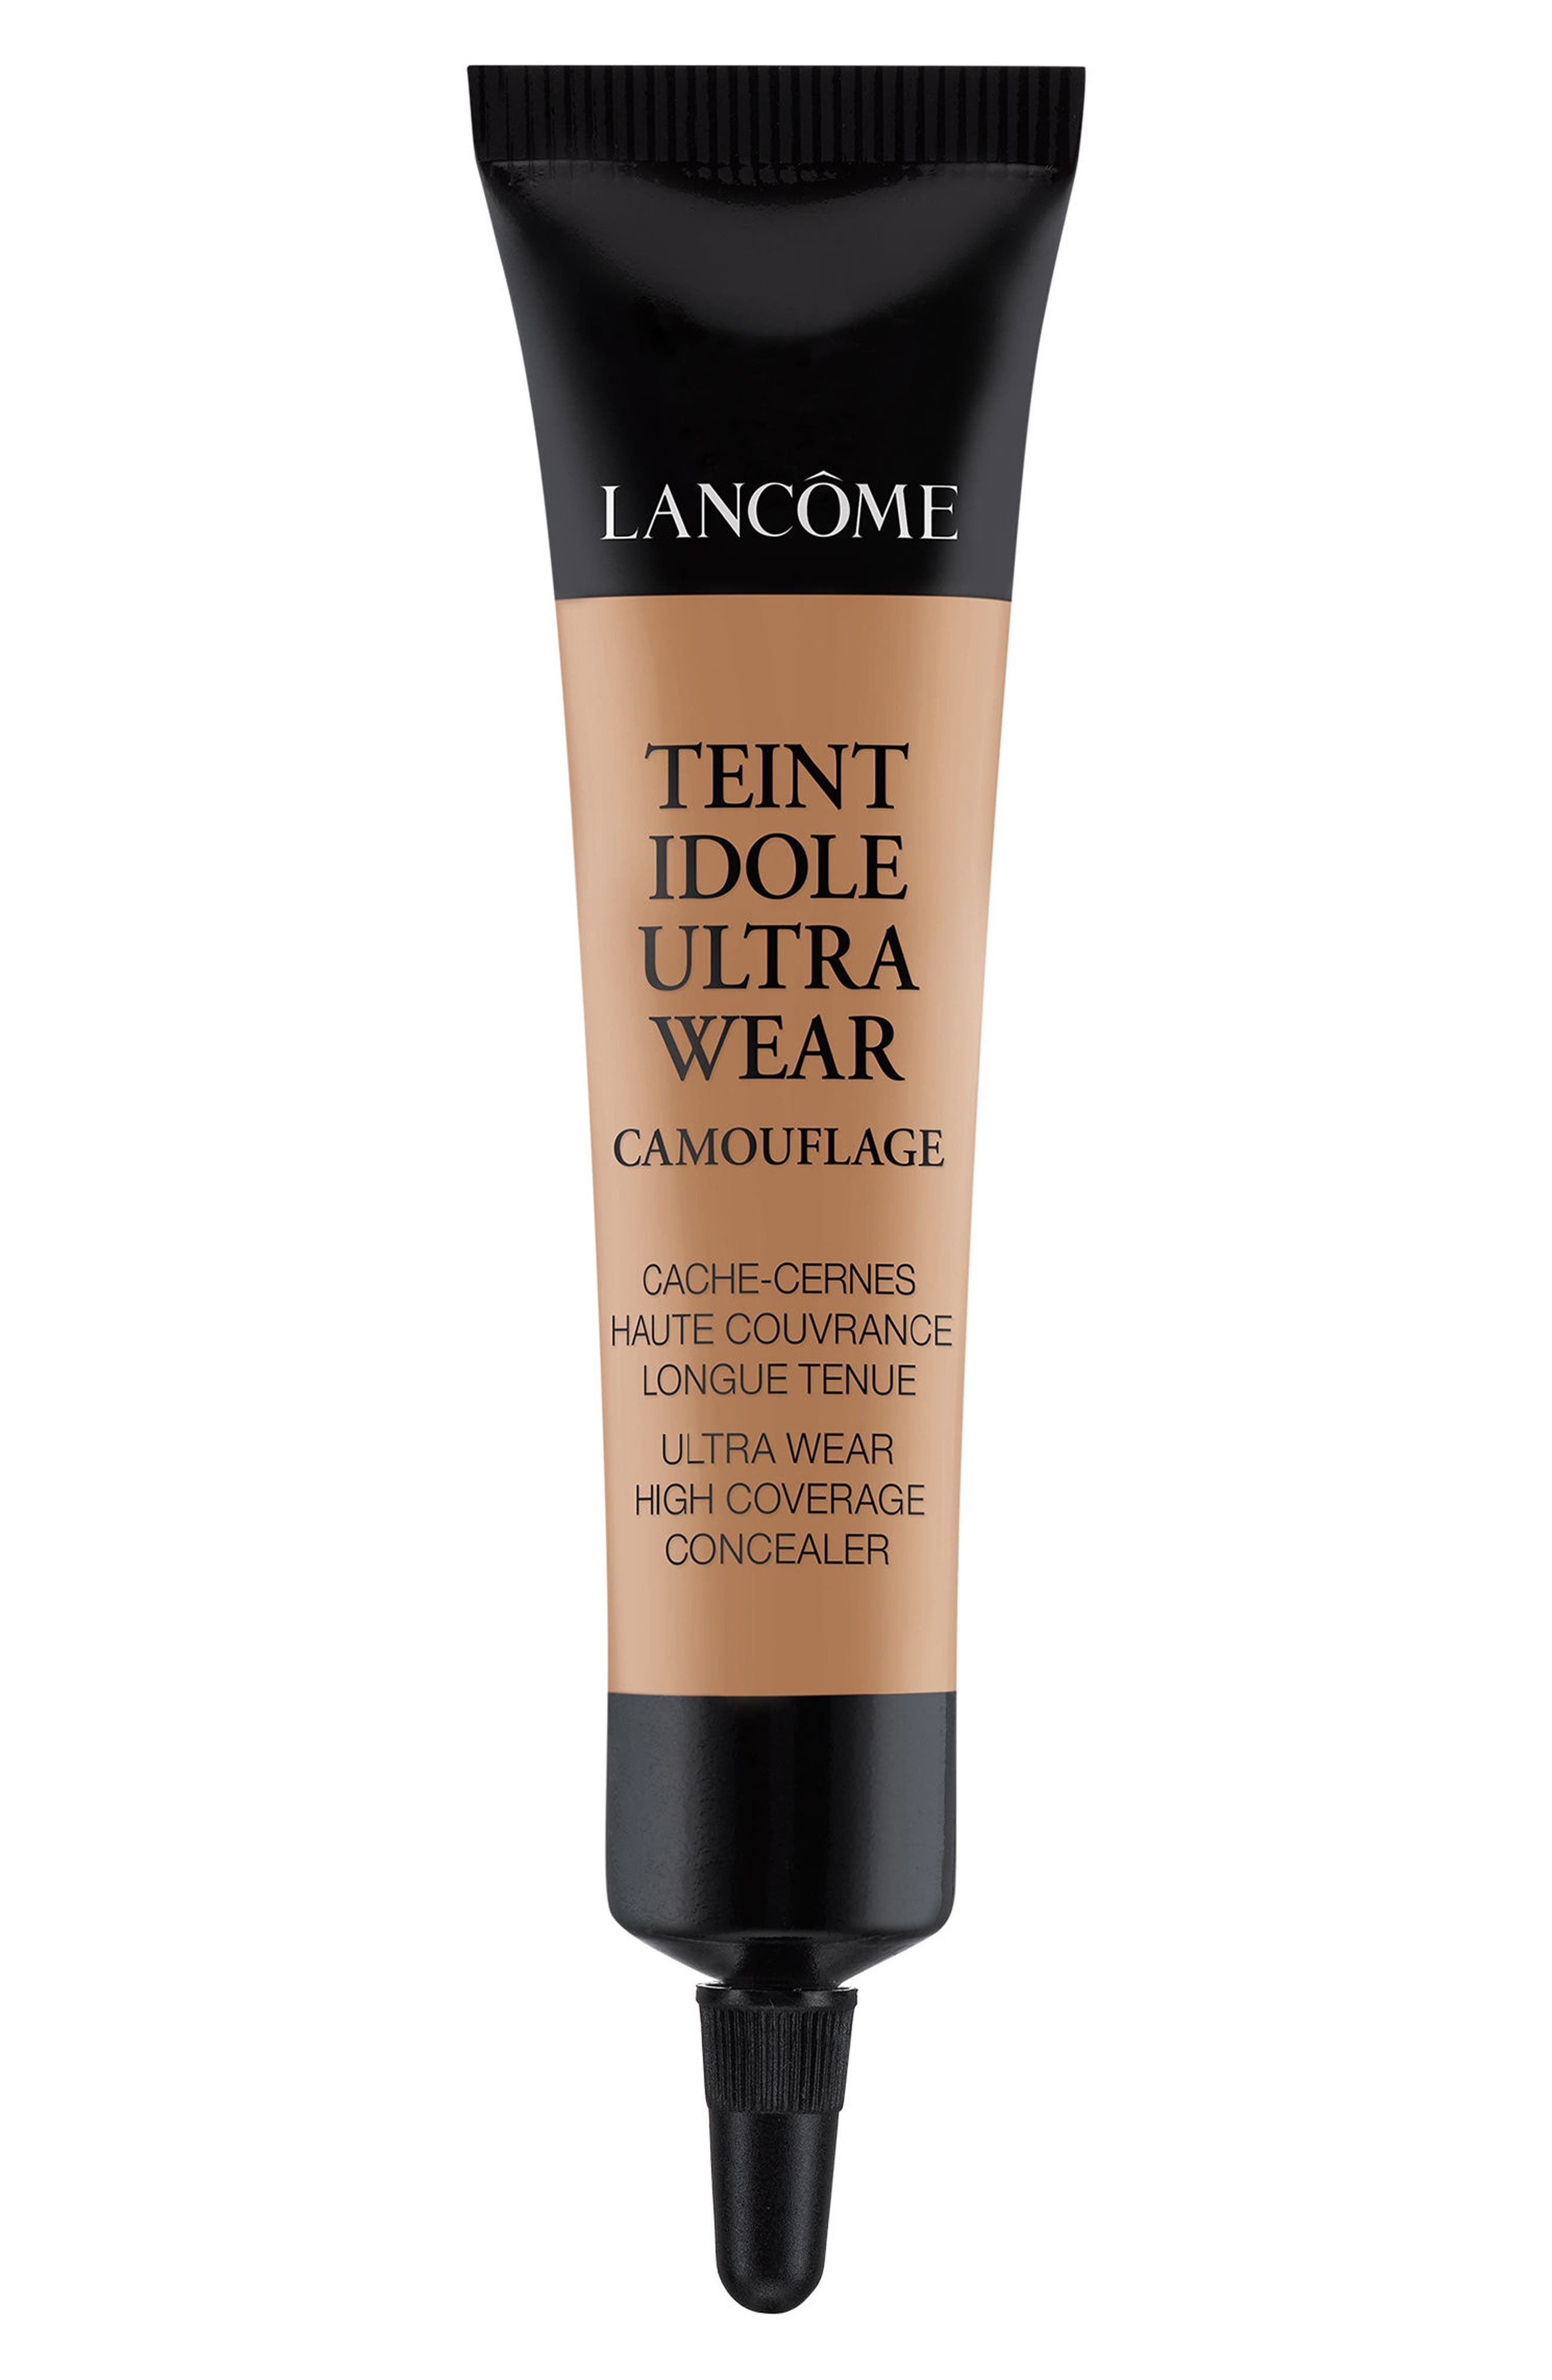 Main Image - Lancôme Teint Idole Ultra Wear Camouflage Concealer